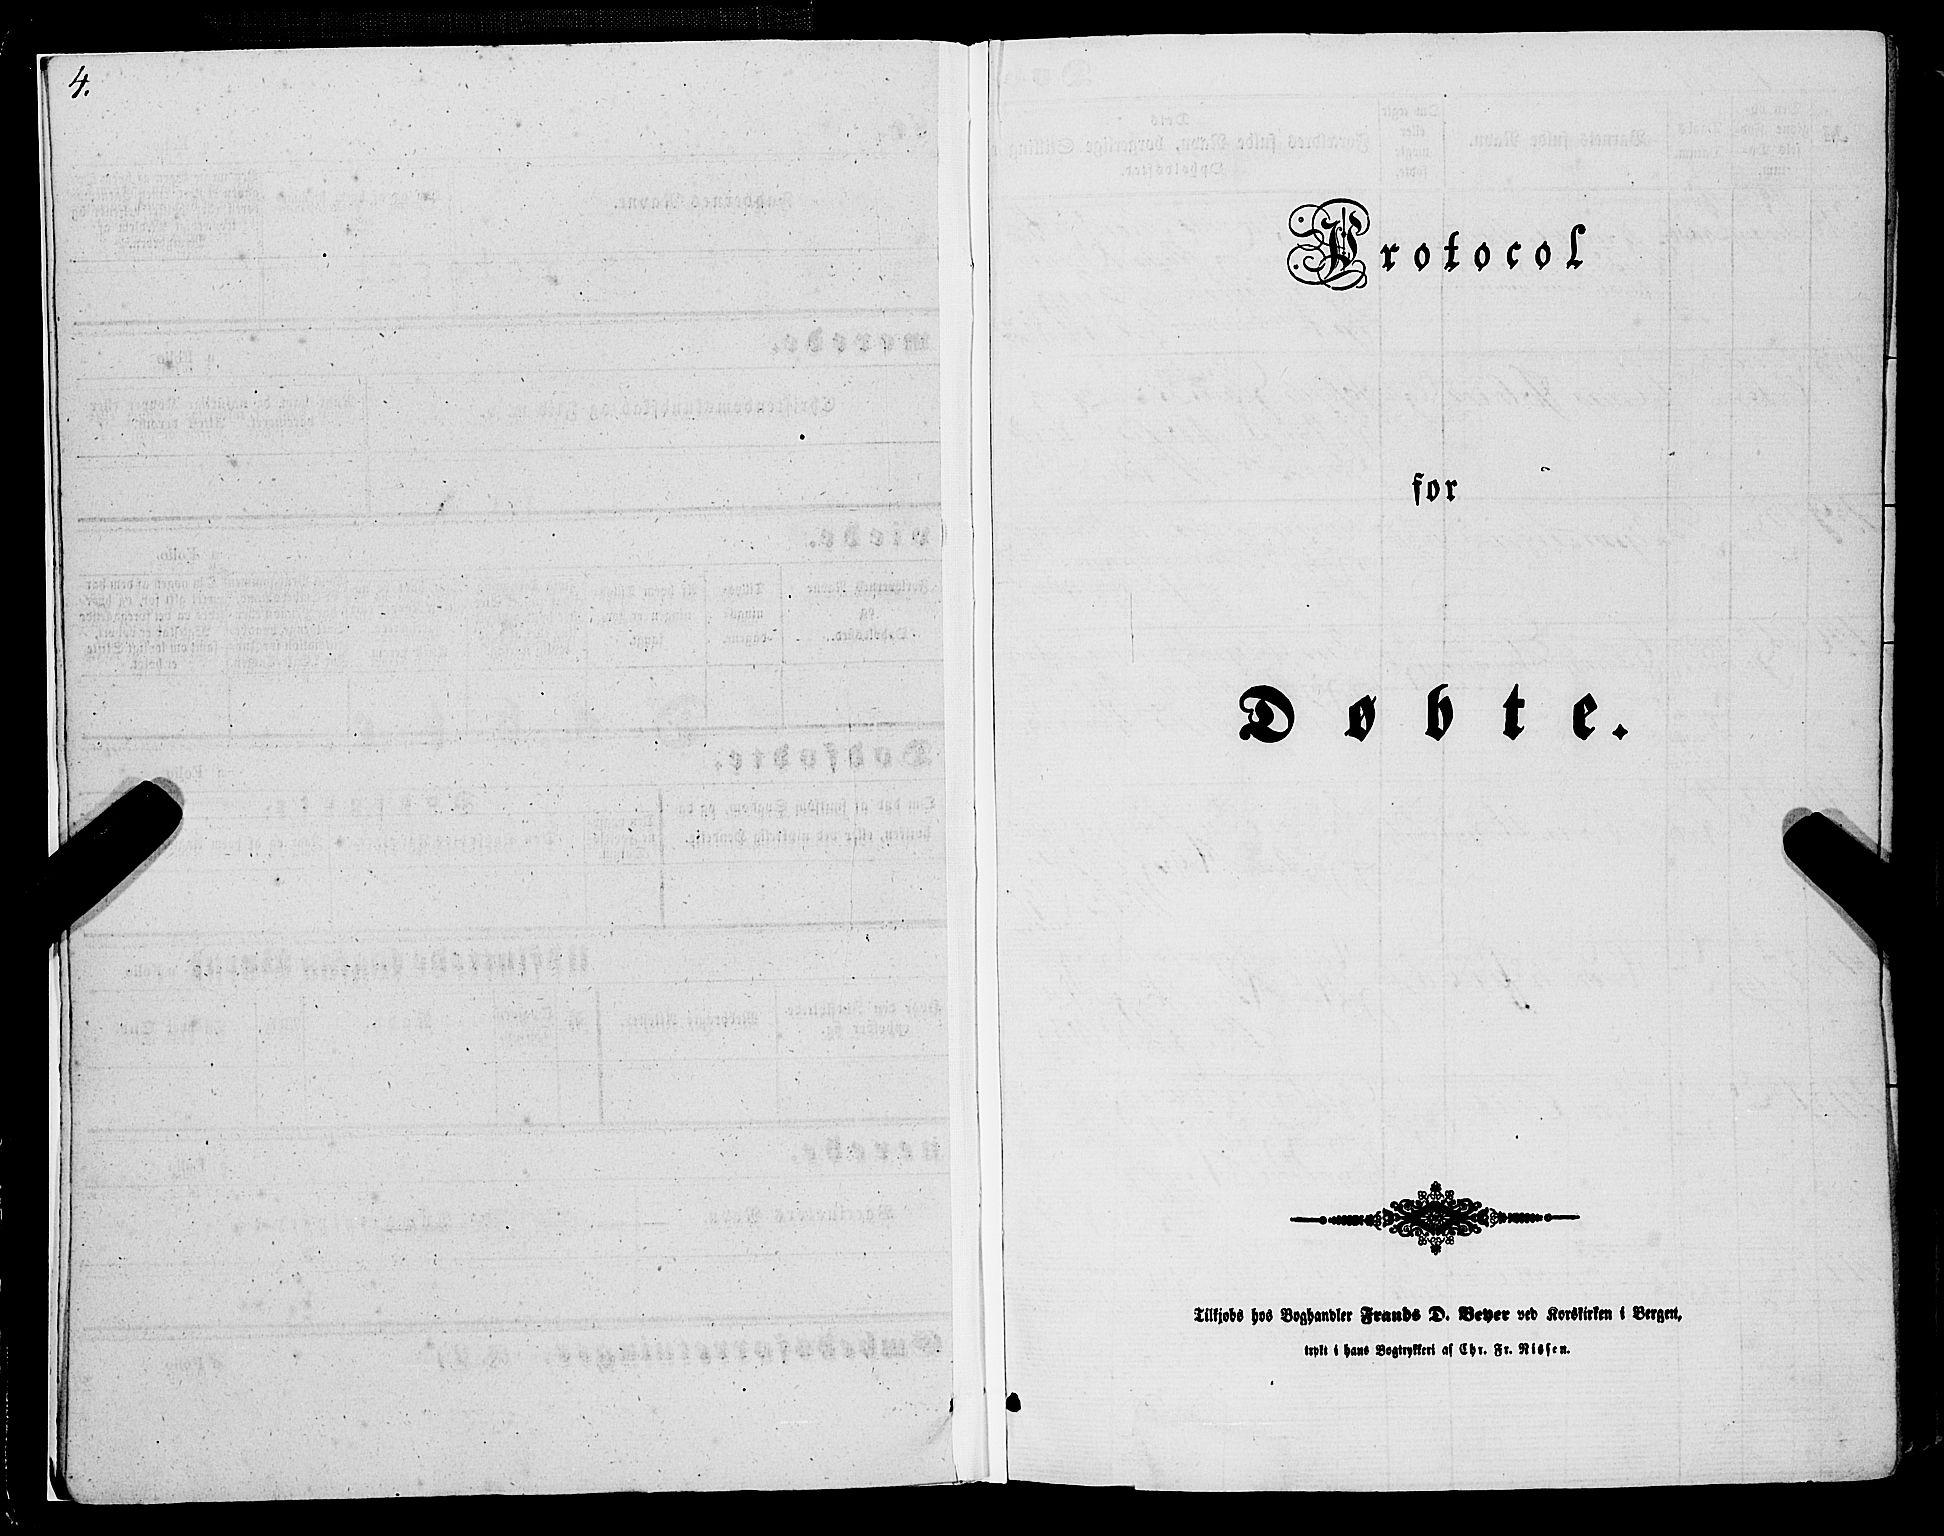 SAB, Domkirken Sokneprestembete, H/Haa/L0020: Ministerialbok nr. B 3, 1851-1859, s. 4